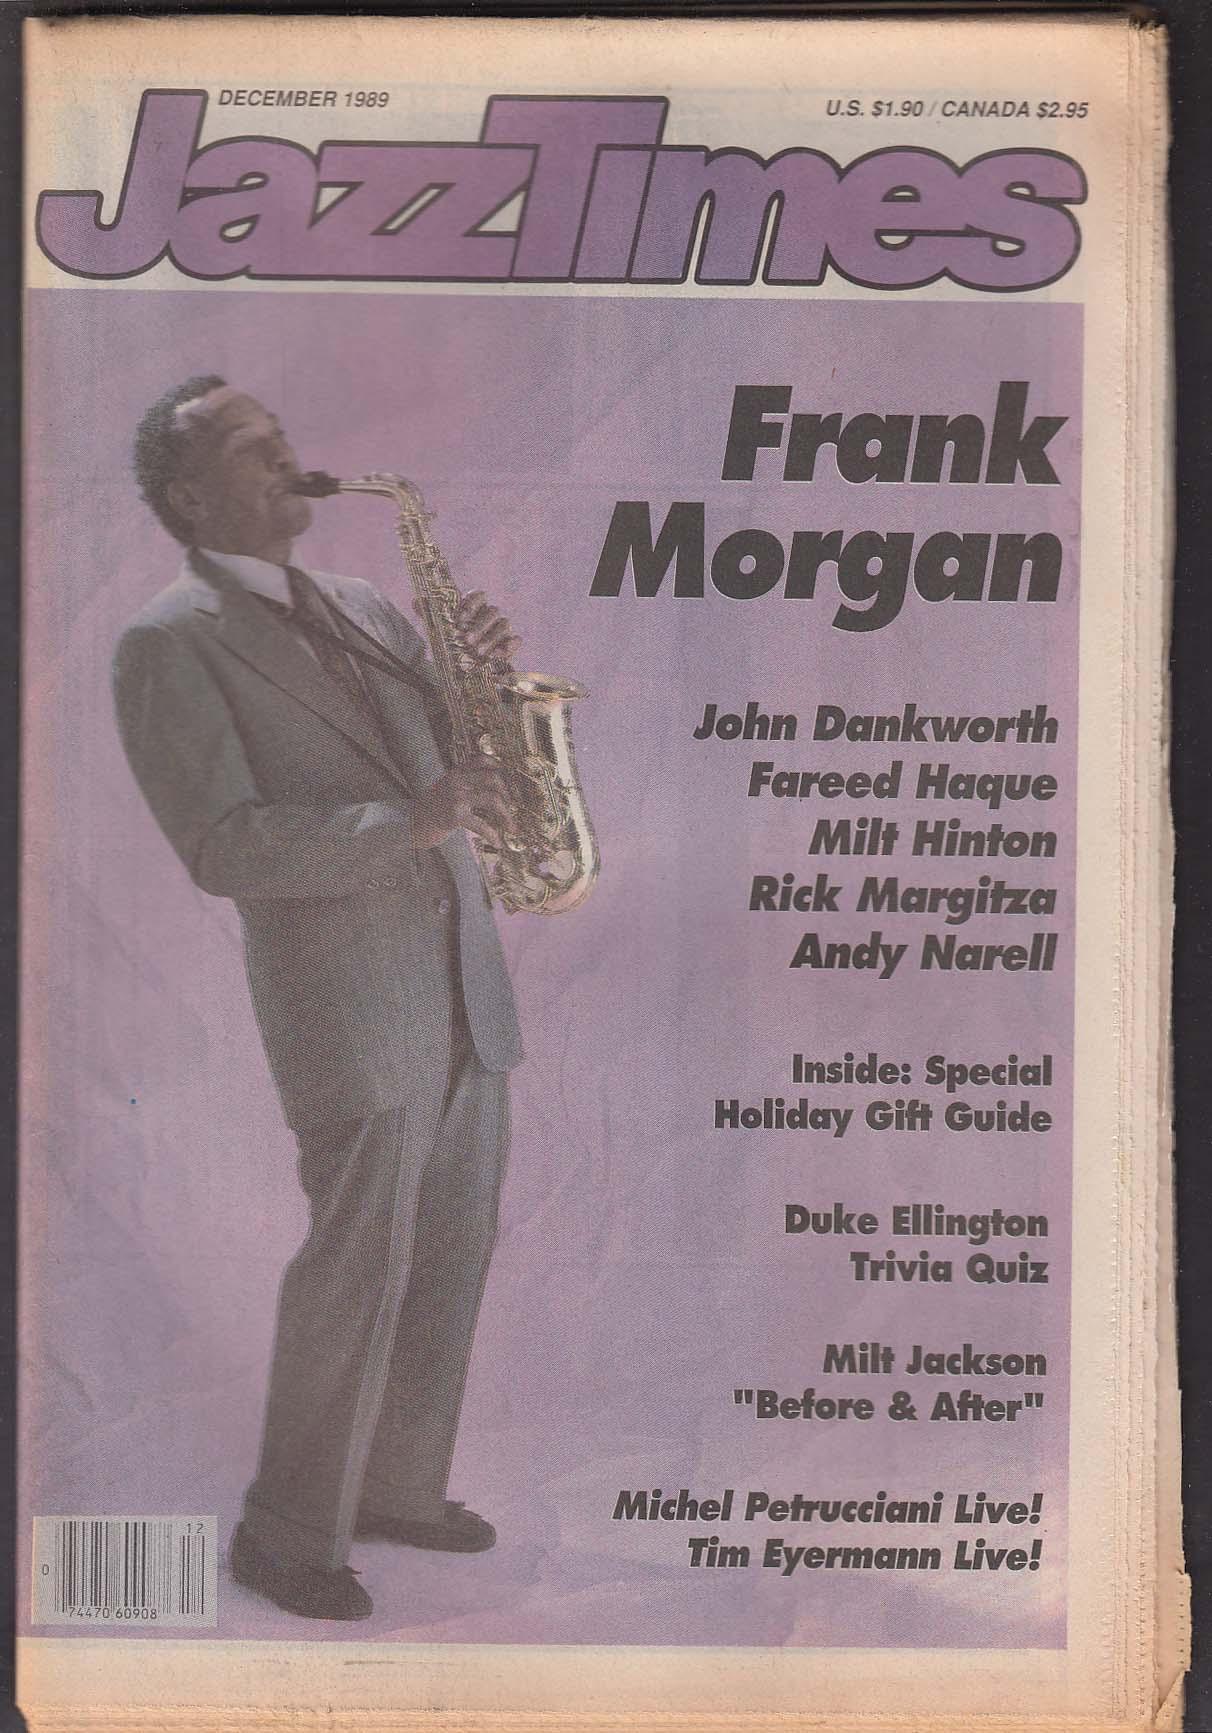 JAZZTIMES Frank Morgan John Dankworth Fareed Haque Milt Hinton ++ 12 1989